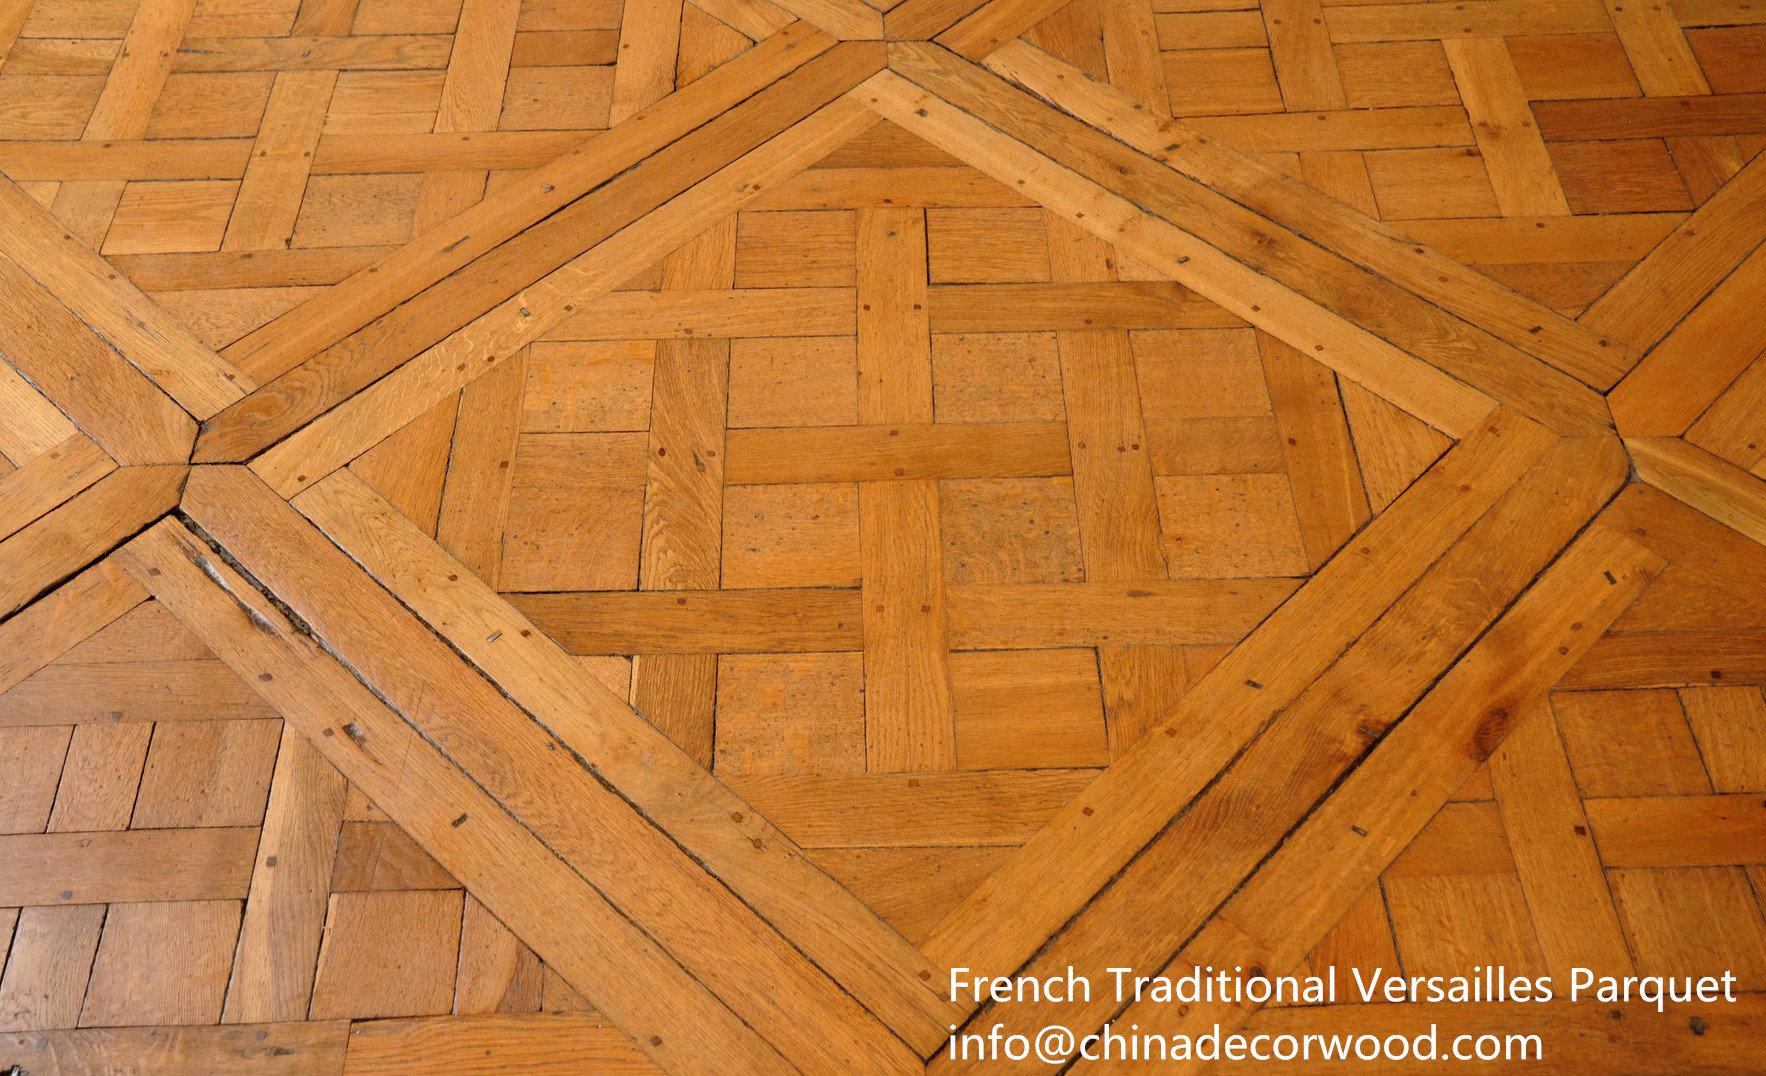 guangzhou nuolande import and export co ltd kitchen cabinet wood flooring parquet floors. Black Bedroom Furniture Sets. Home Design Ideas